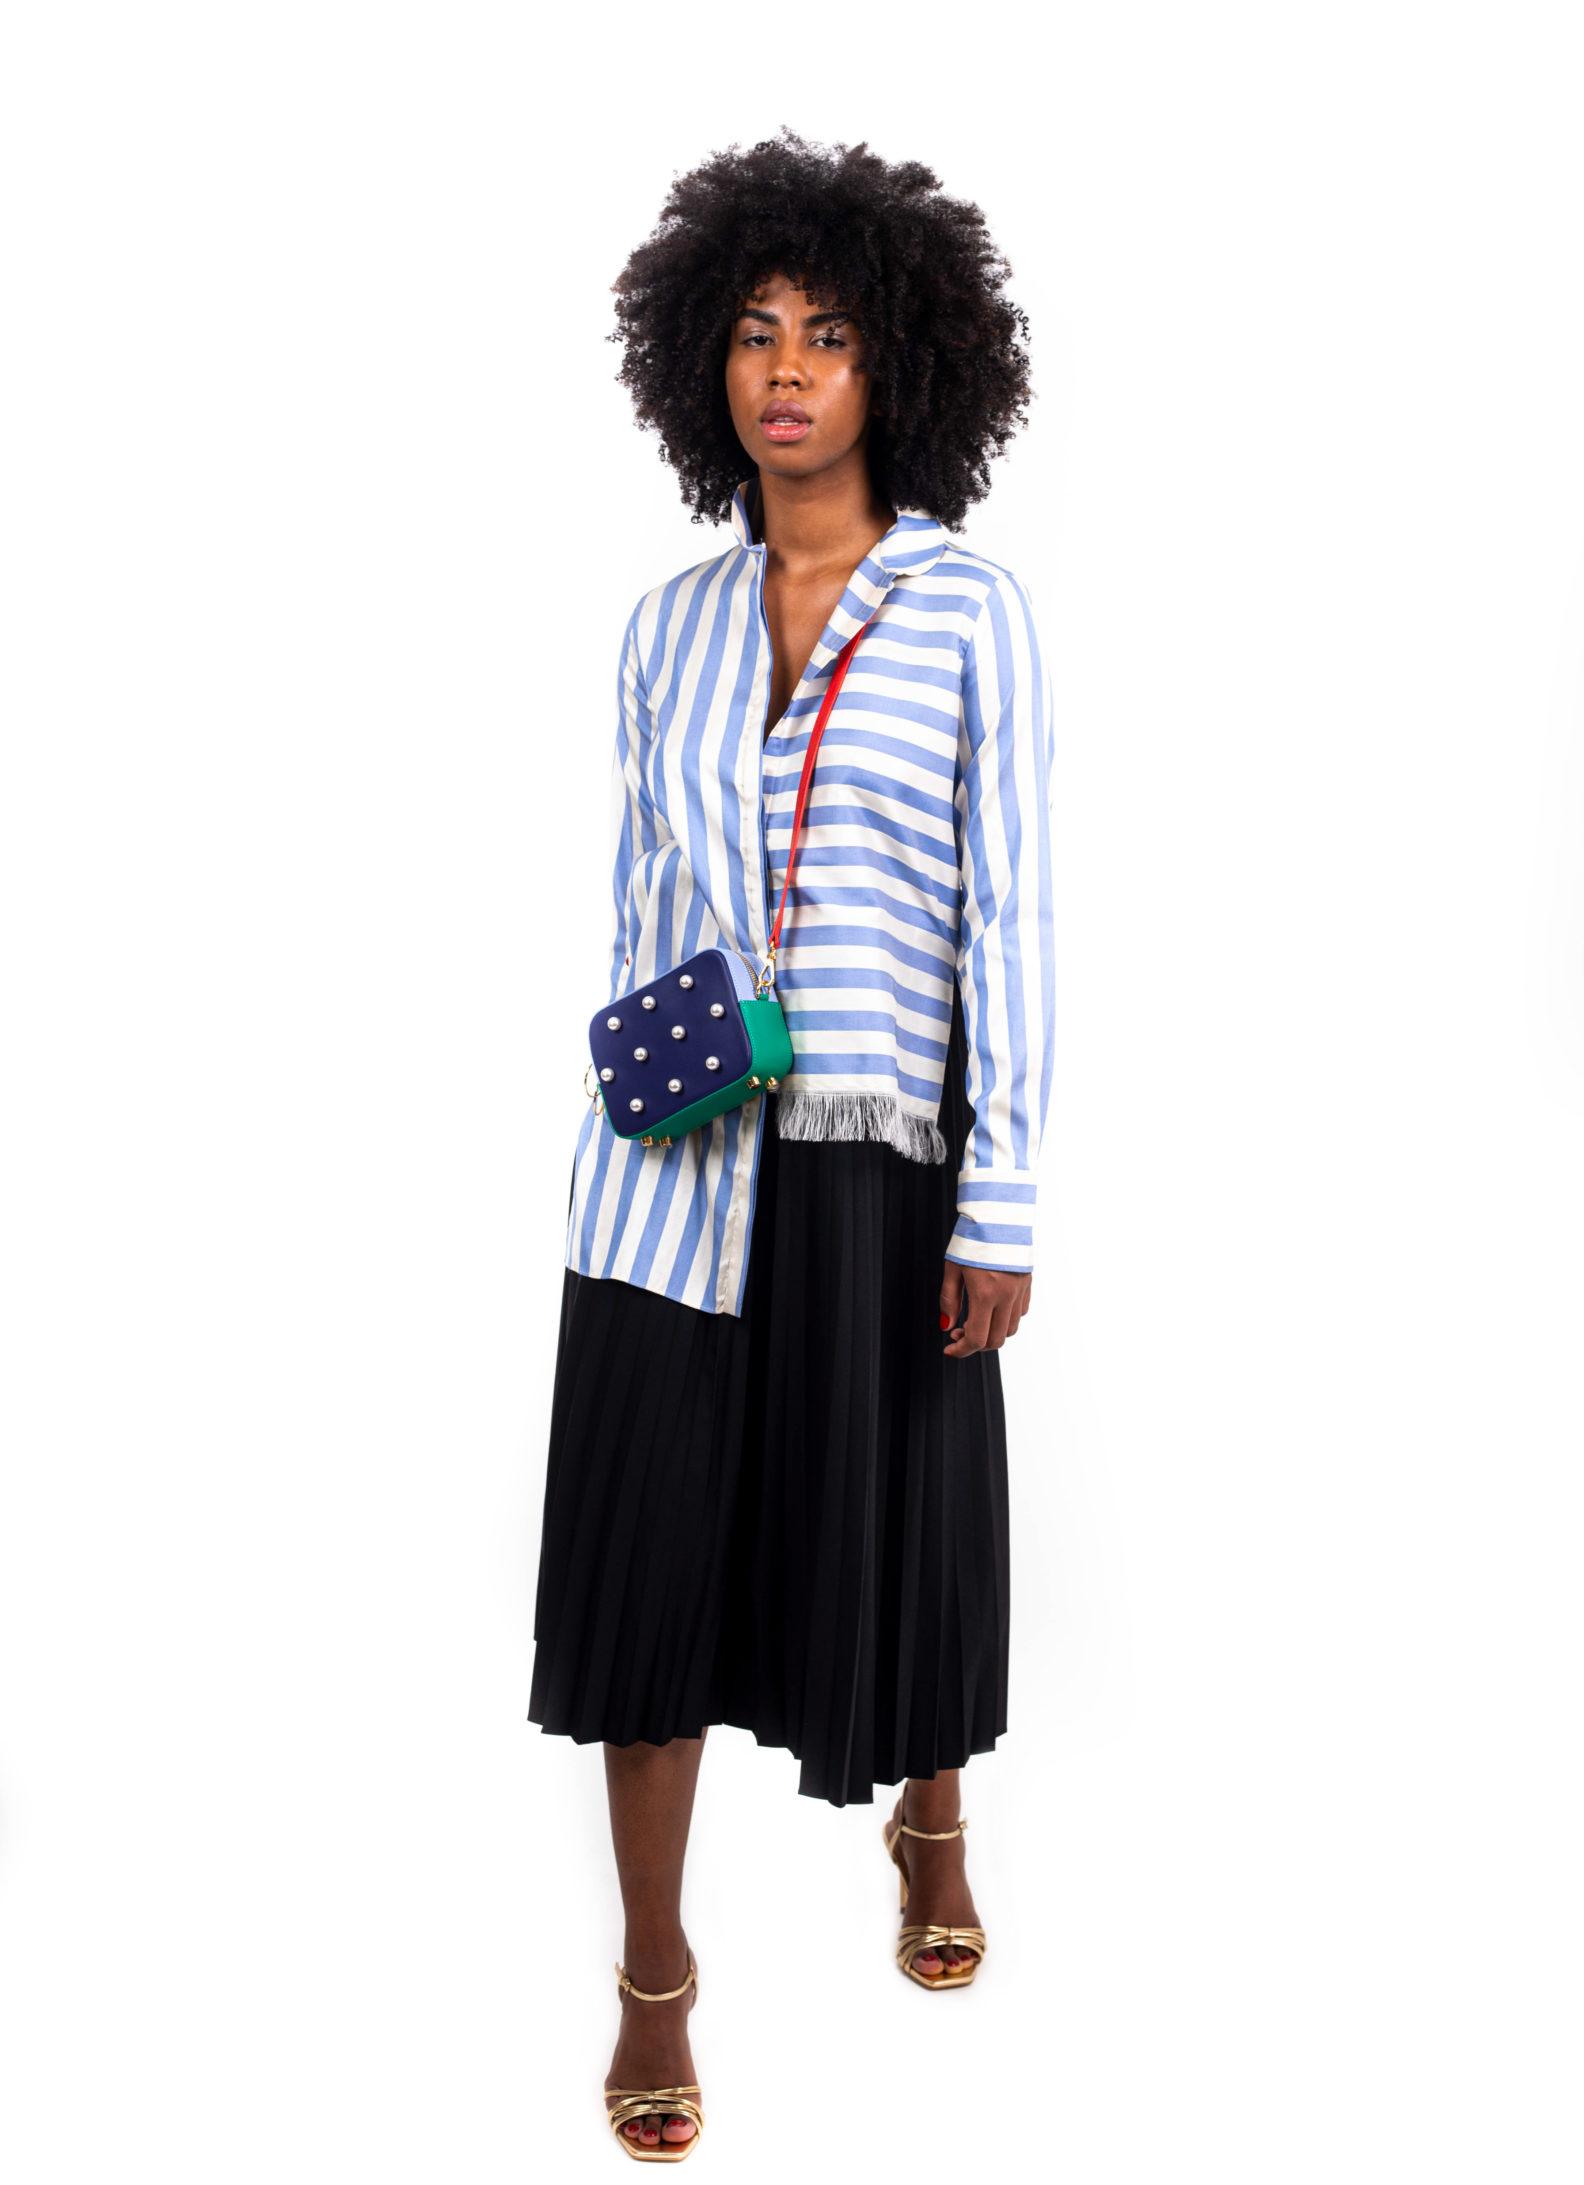 chemise-asymetrique-soie-tissee-main-col-mandarin-anissa-aida-affaires-etrangeres-chemise-en-soie-anissa-aida-silk-shirt